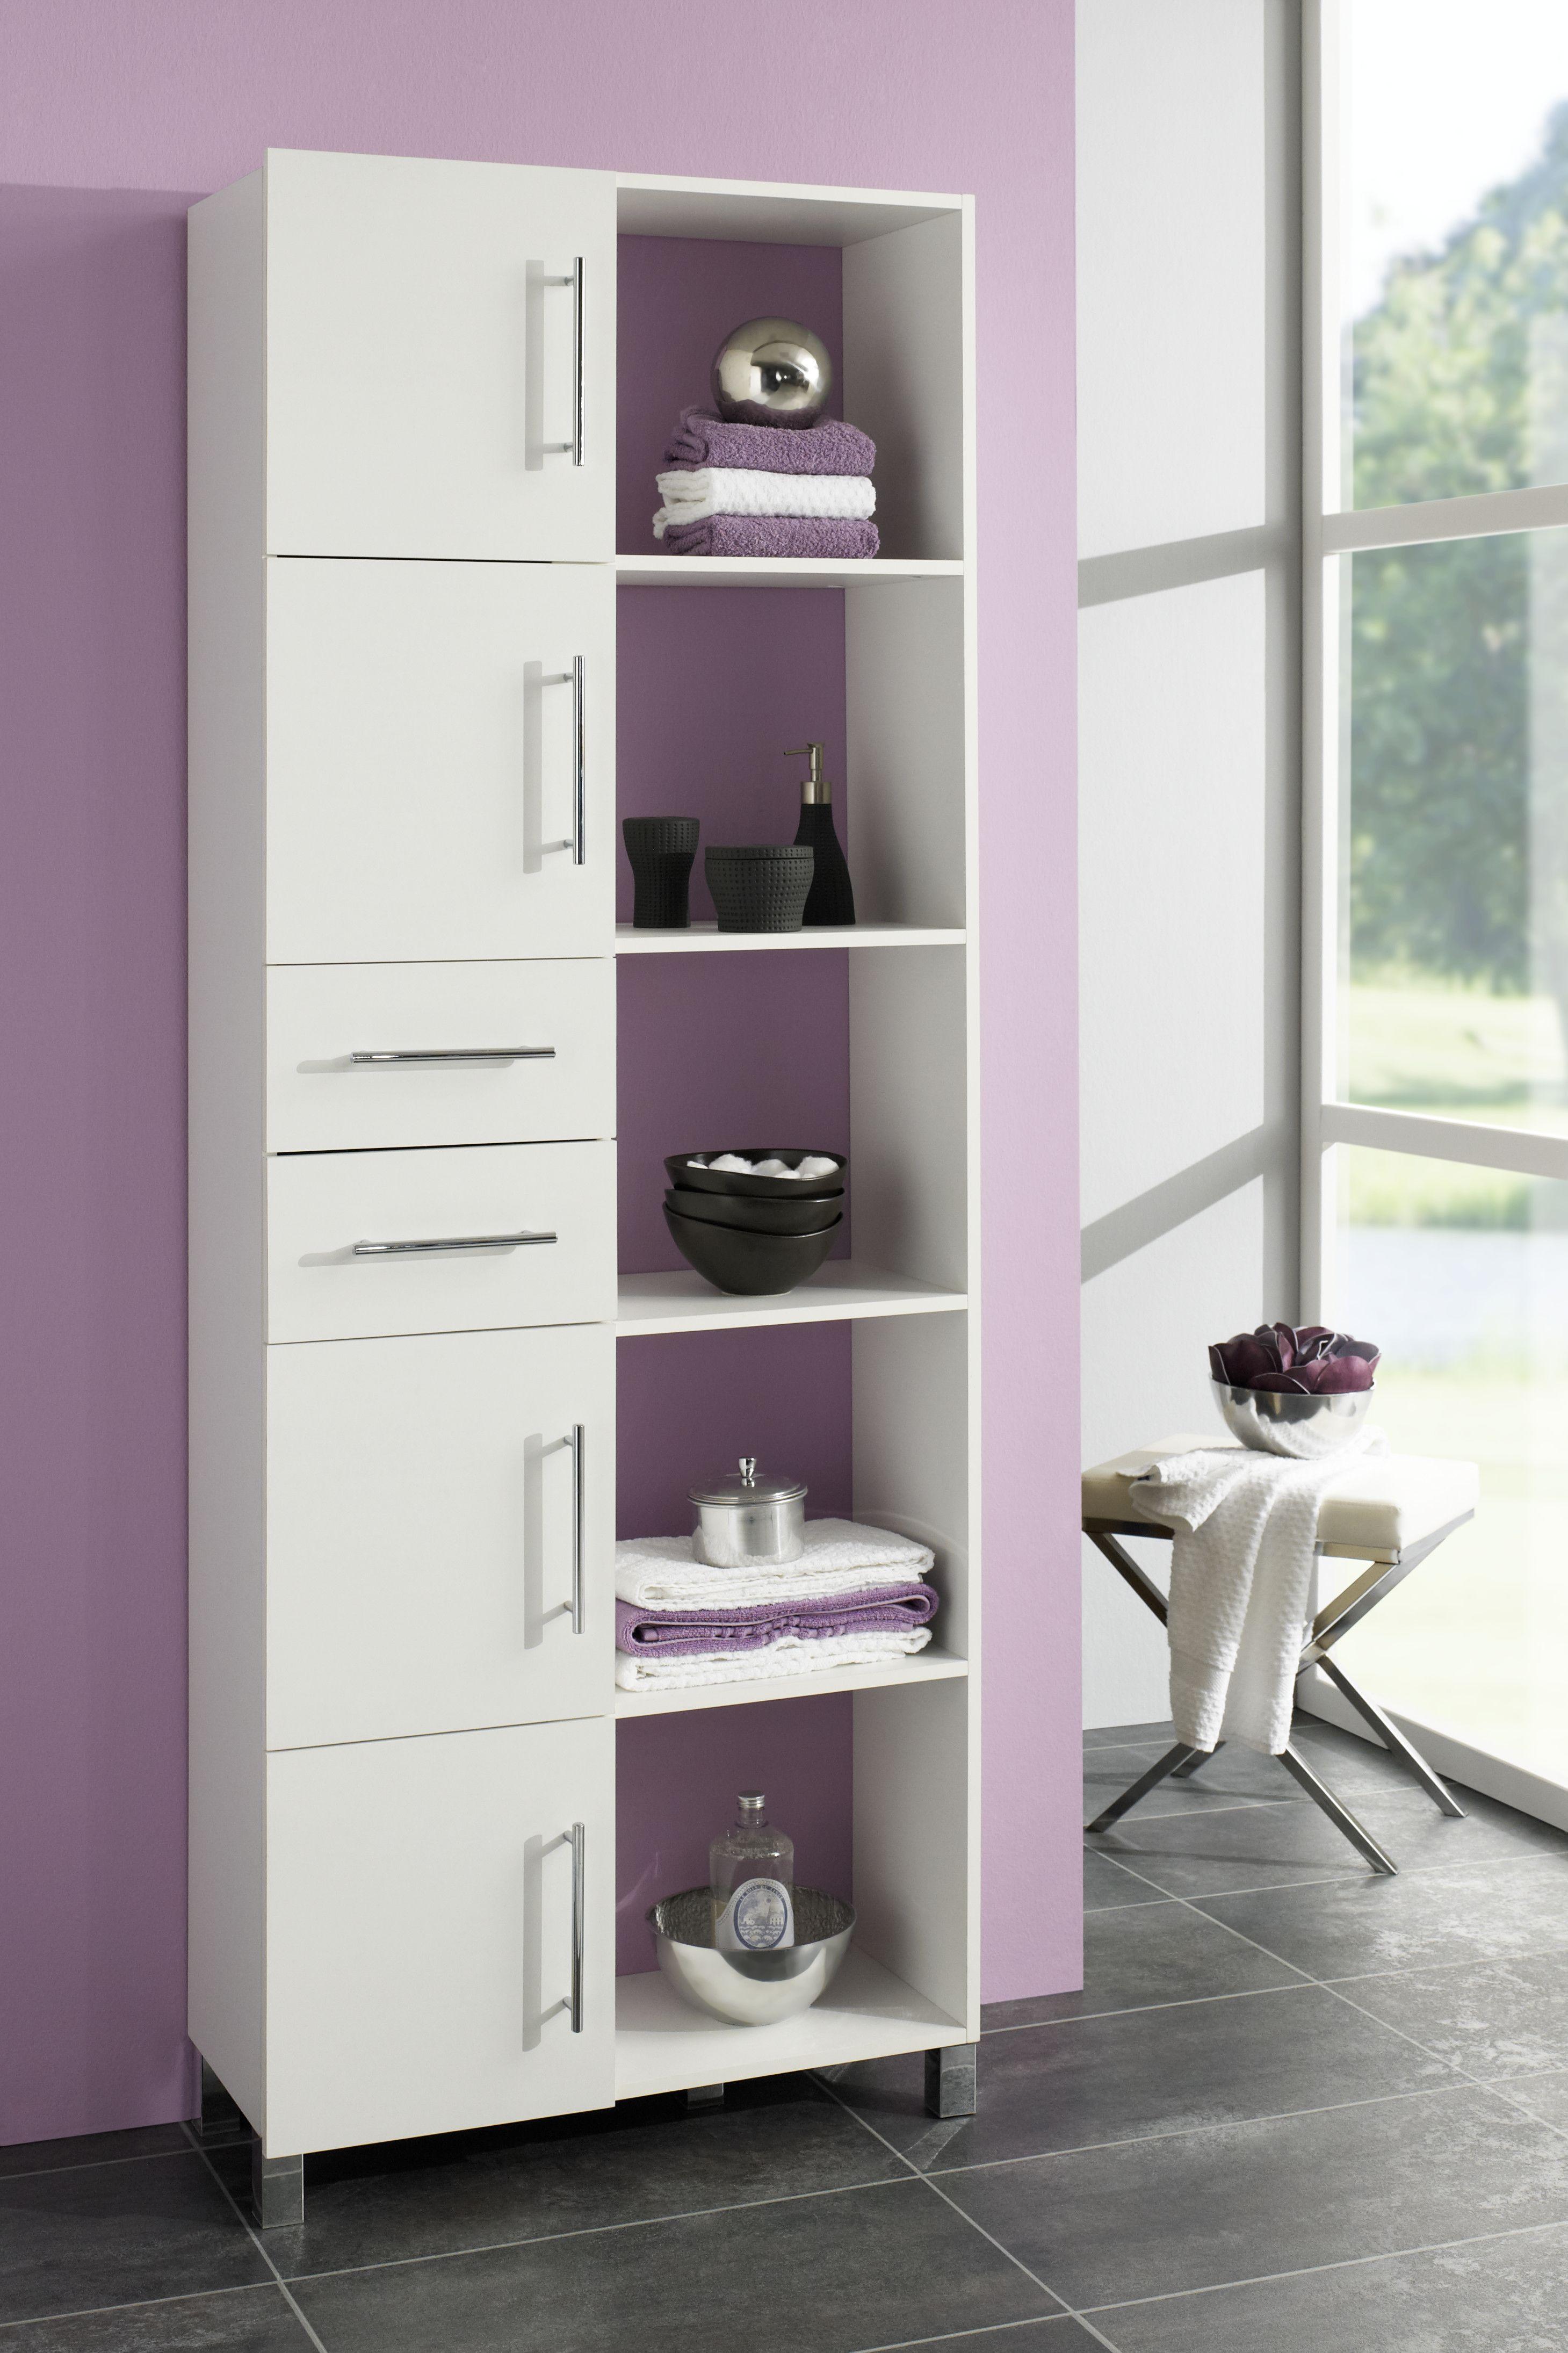 Badezimmerschrank Modern With Images Home Main Bathroom Ideas